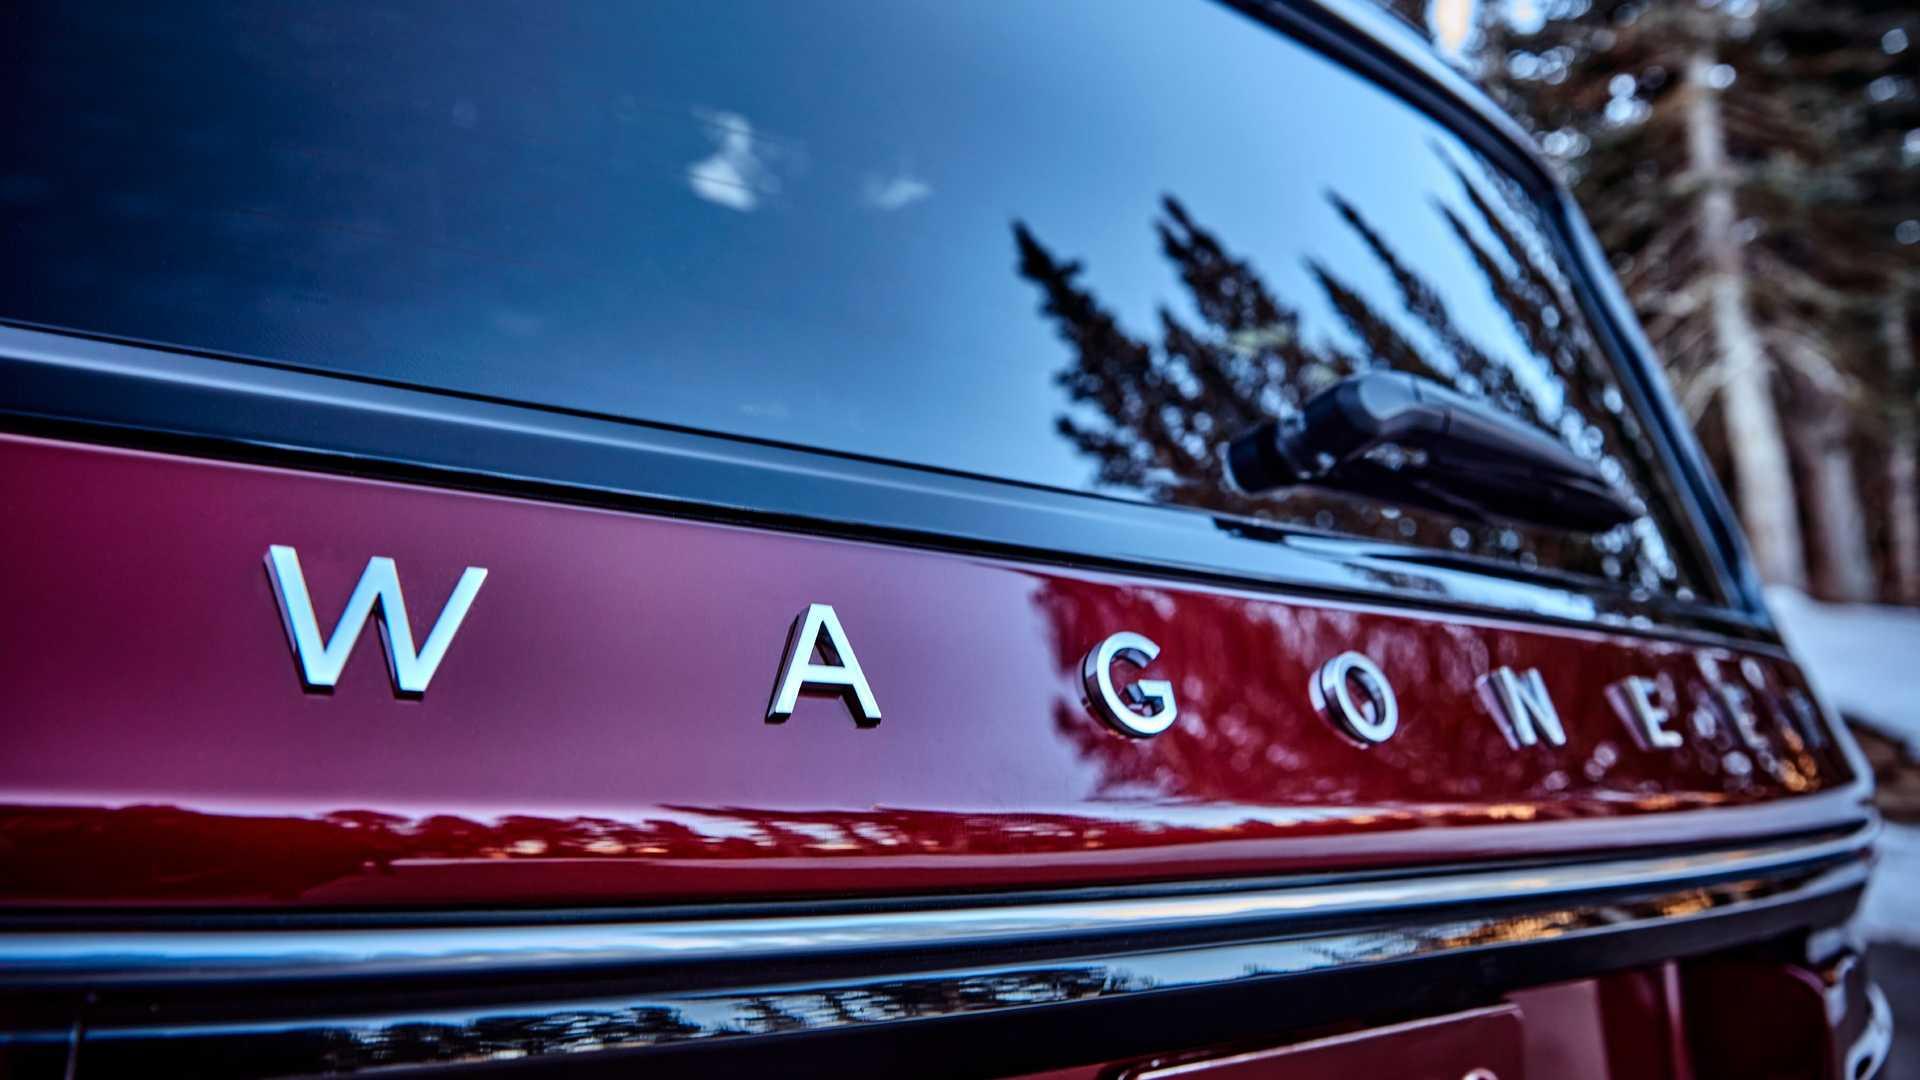 2022-jeep-wagoneer-exterior-badging-1